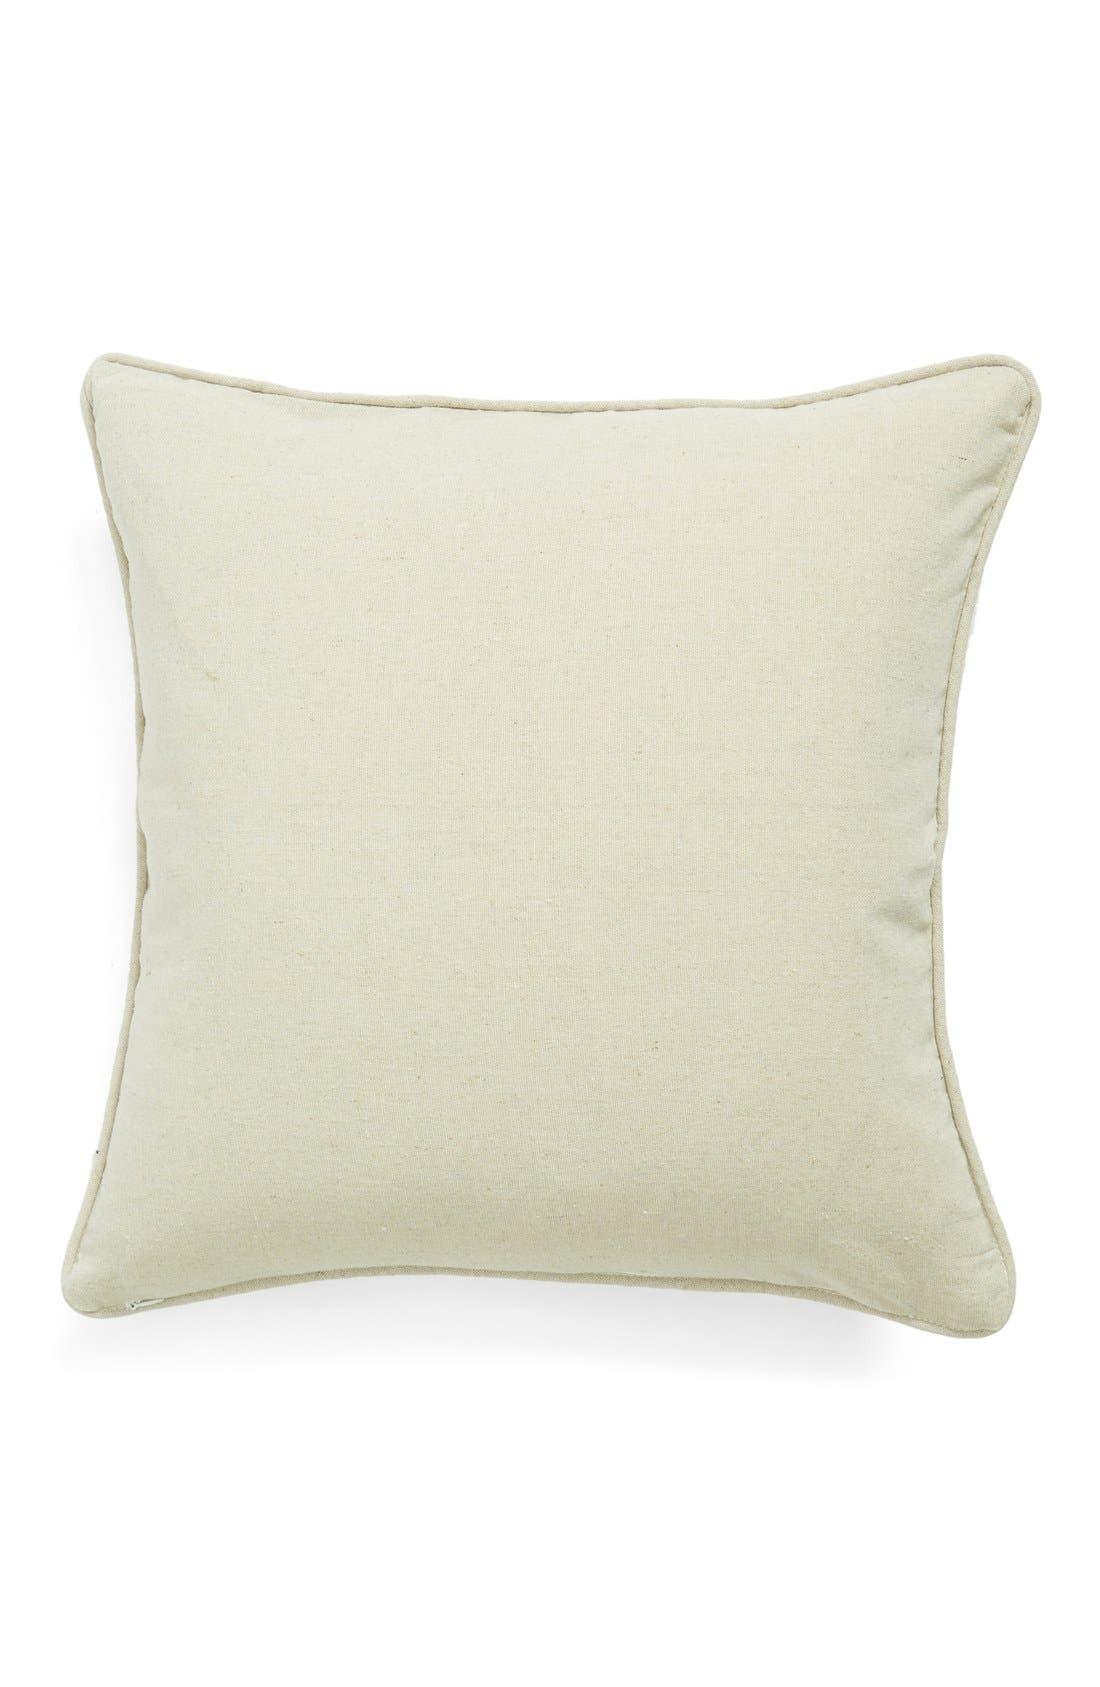 Alternate Image 2  - Levtex 'Parma' Stitch Pillow